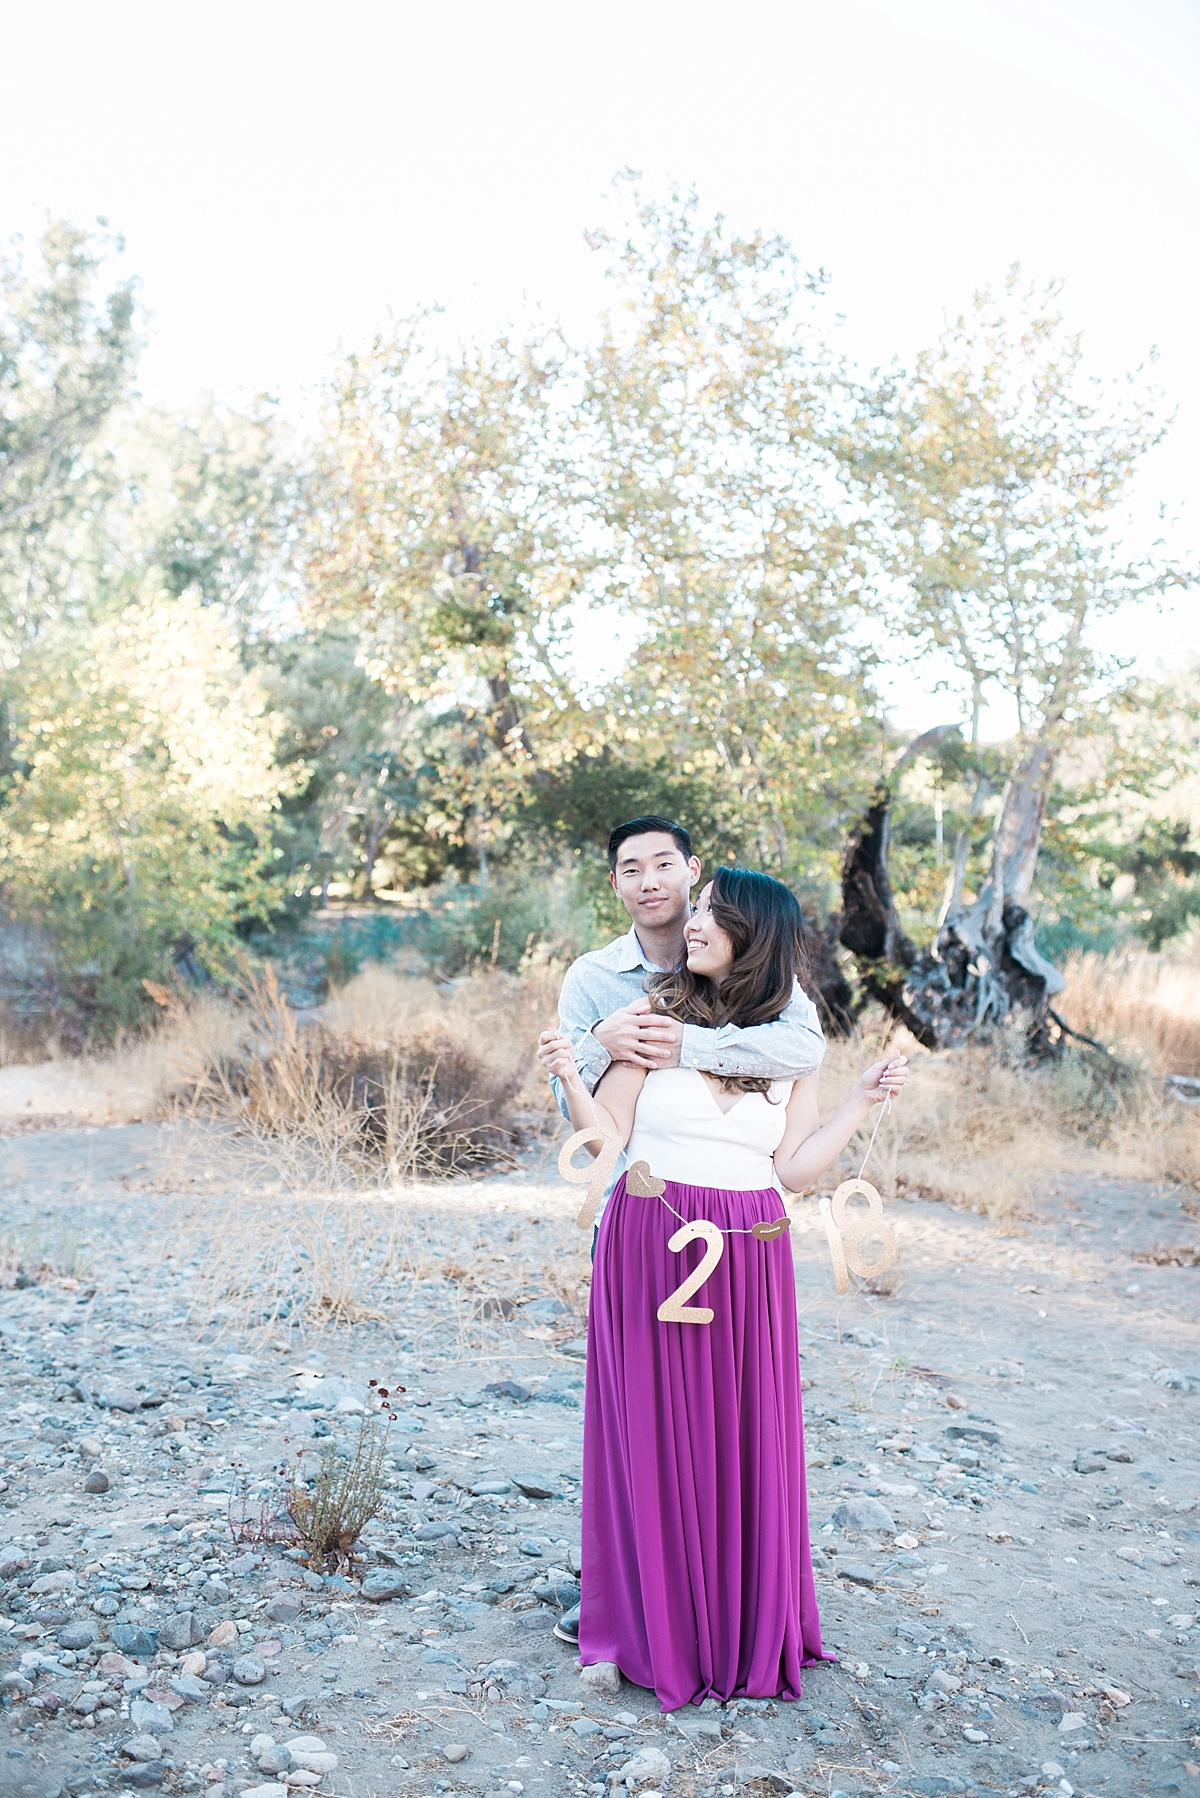 Malibu-Engagement-Photographer-Ally-Jeff-Carissa-Woo-Photography_0019.jpg